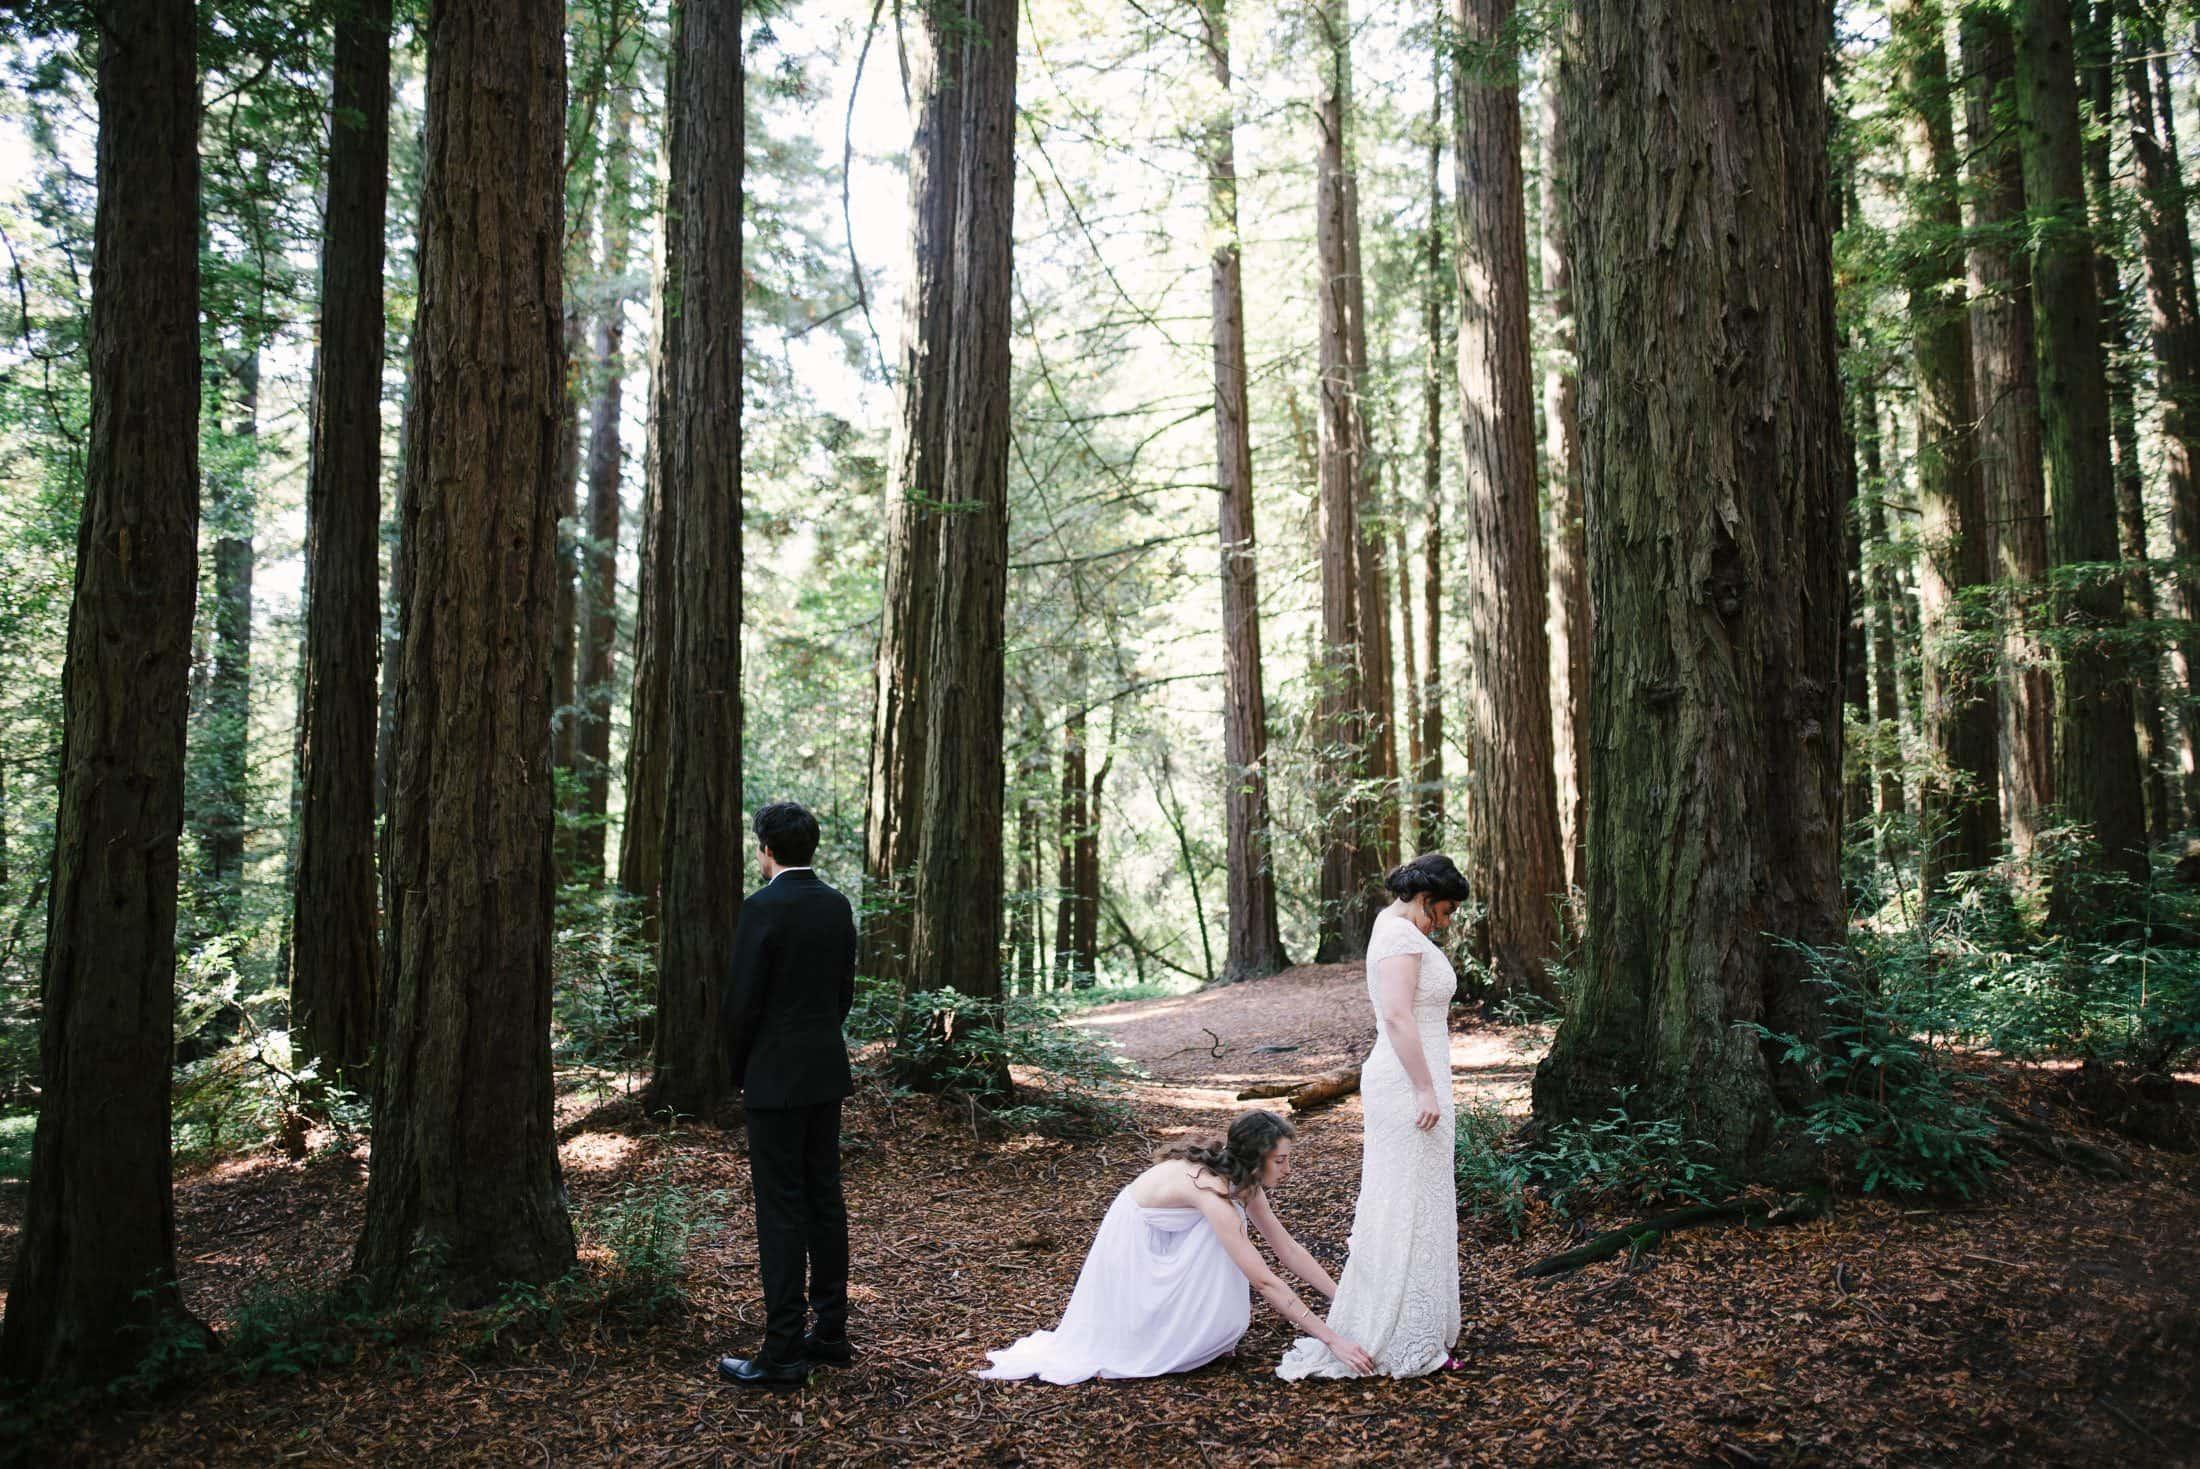 First look at Robert's Regional Park wedding